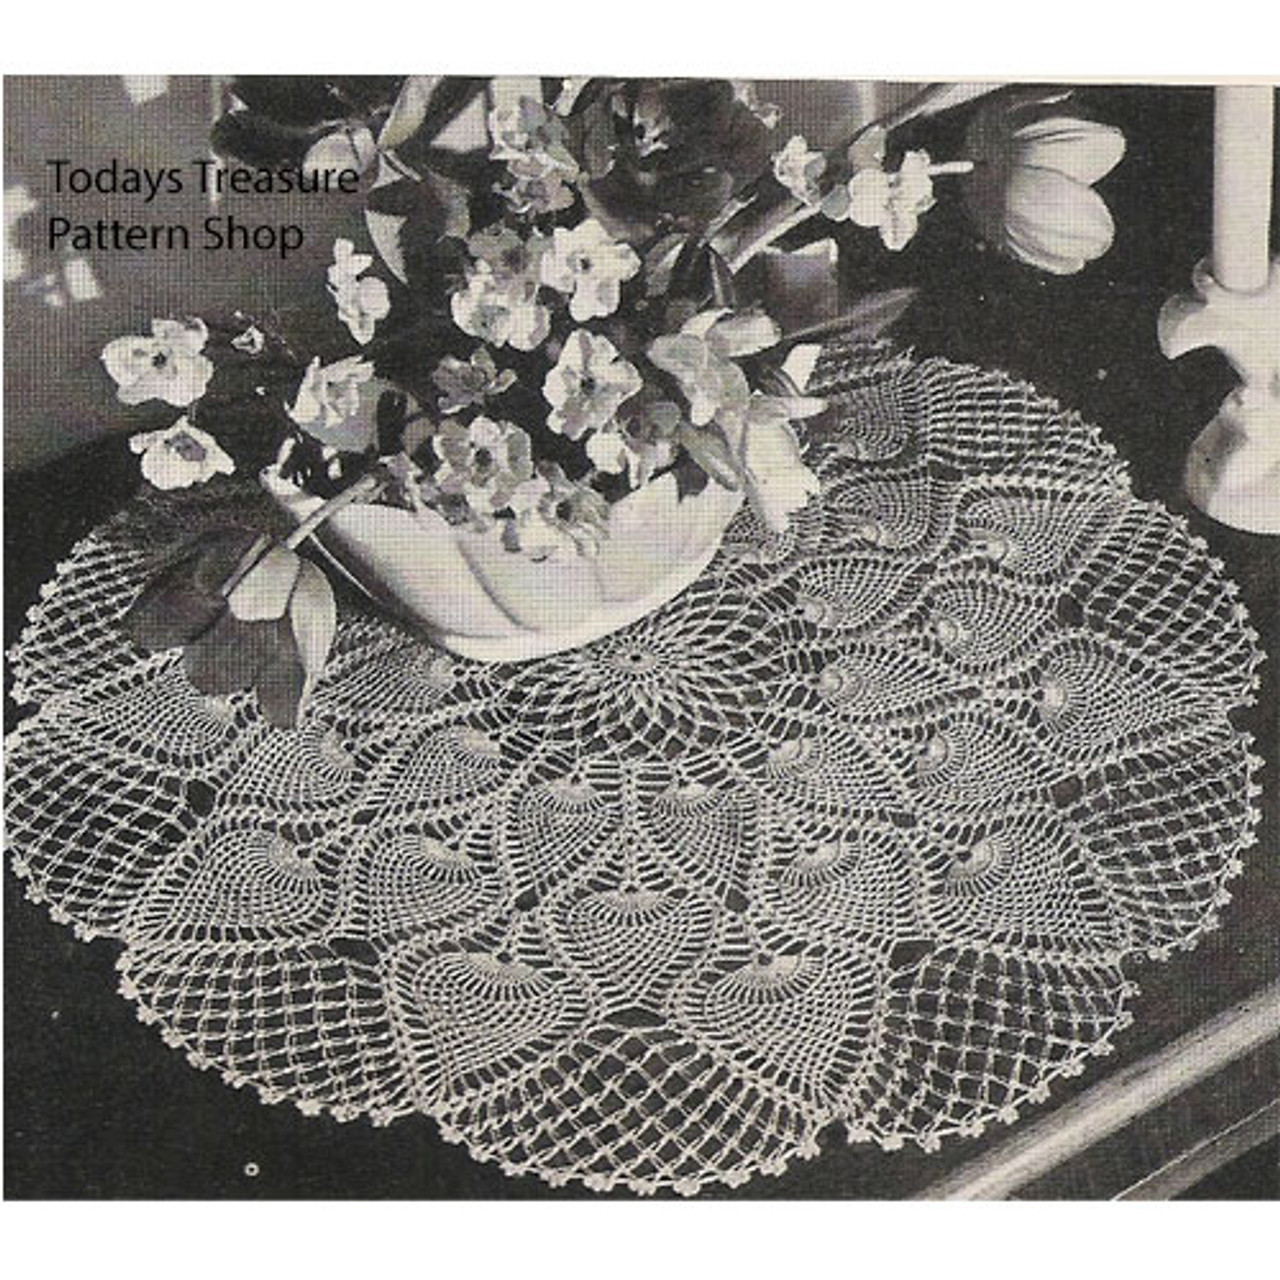 Crochet Pineapple Centerpiece Doily Pattern